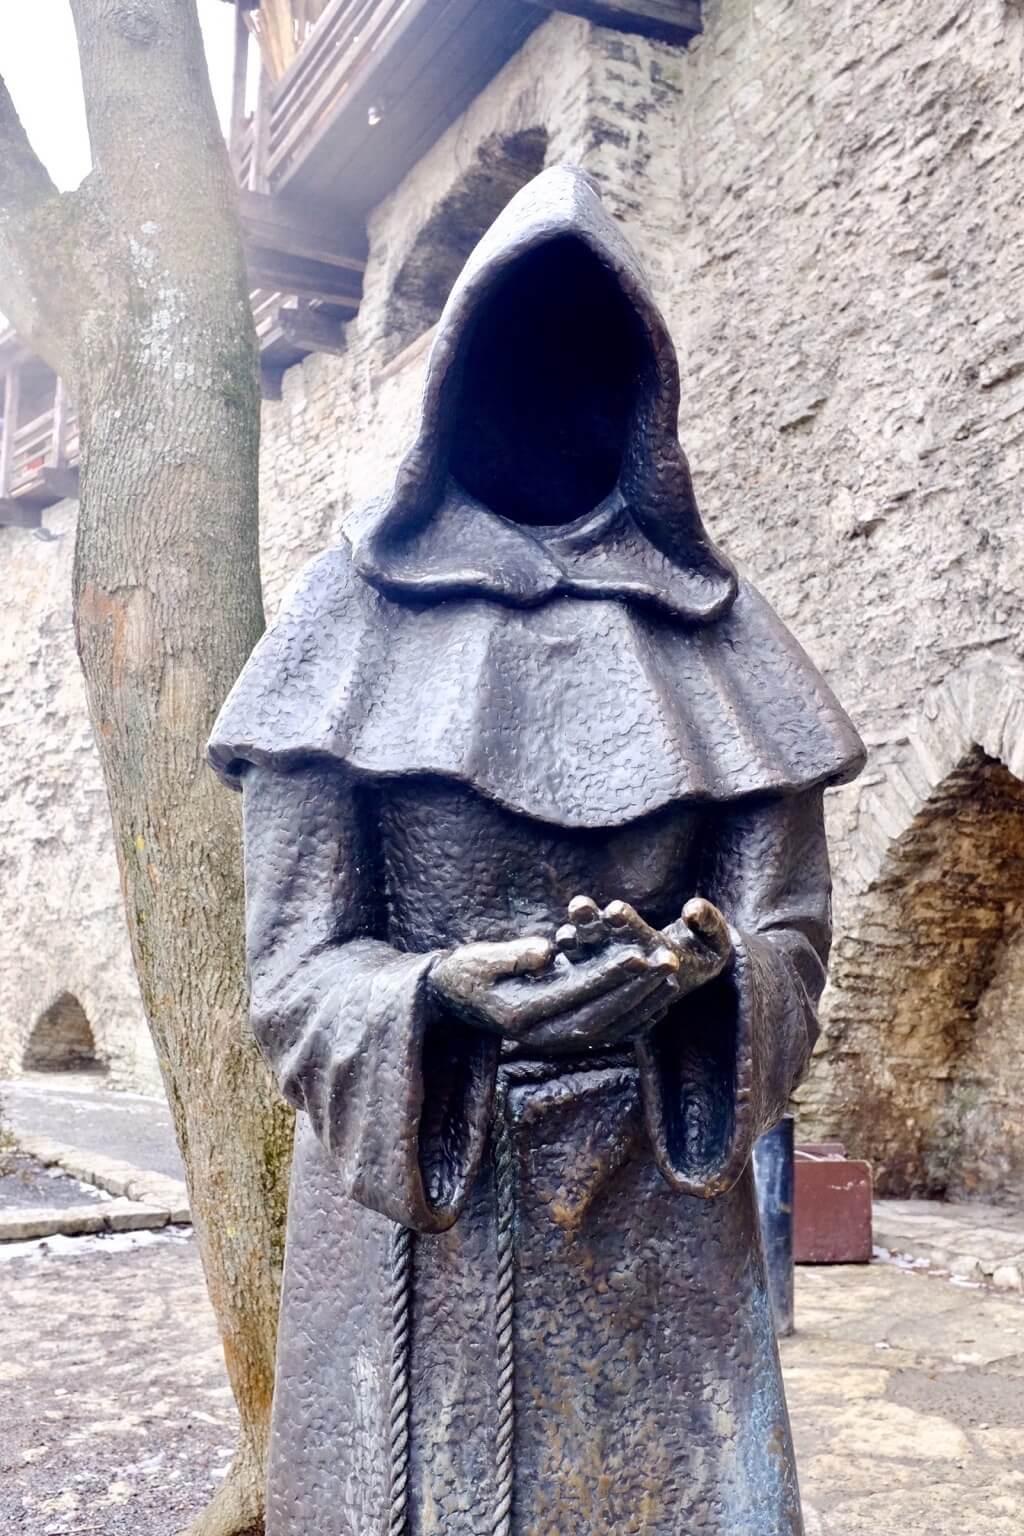 Mysterious monk as seen on a weekend in Tallinn